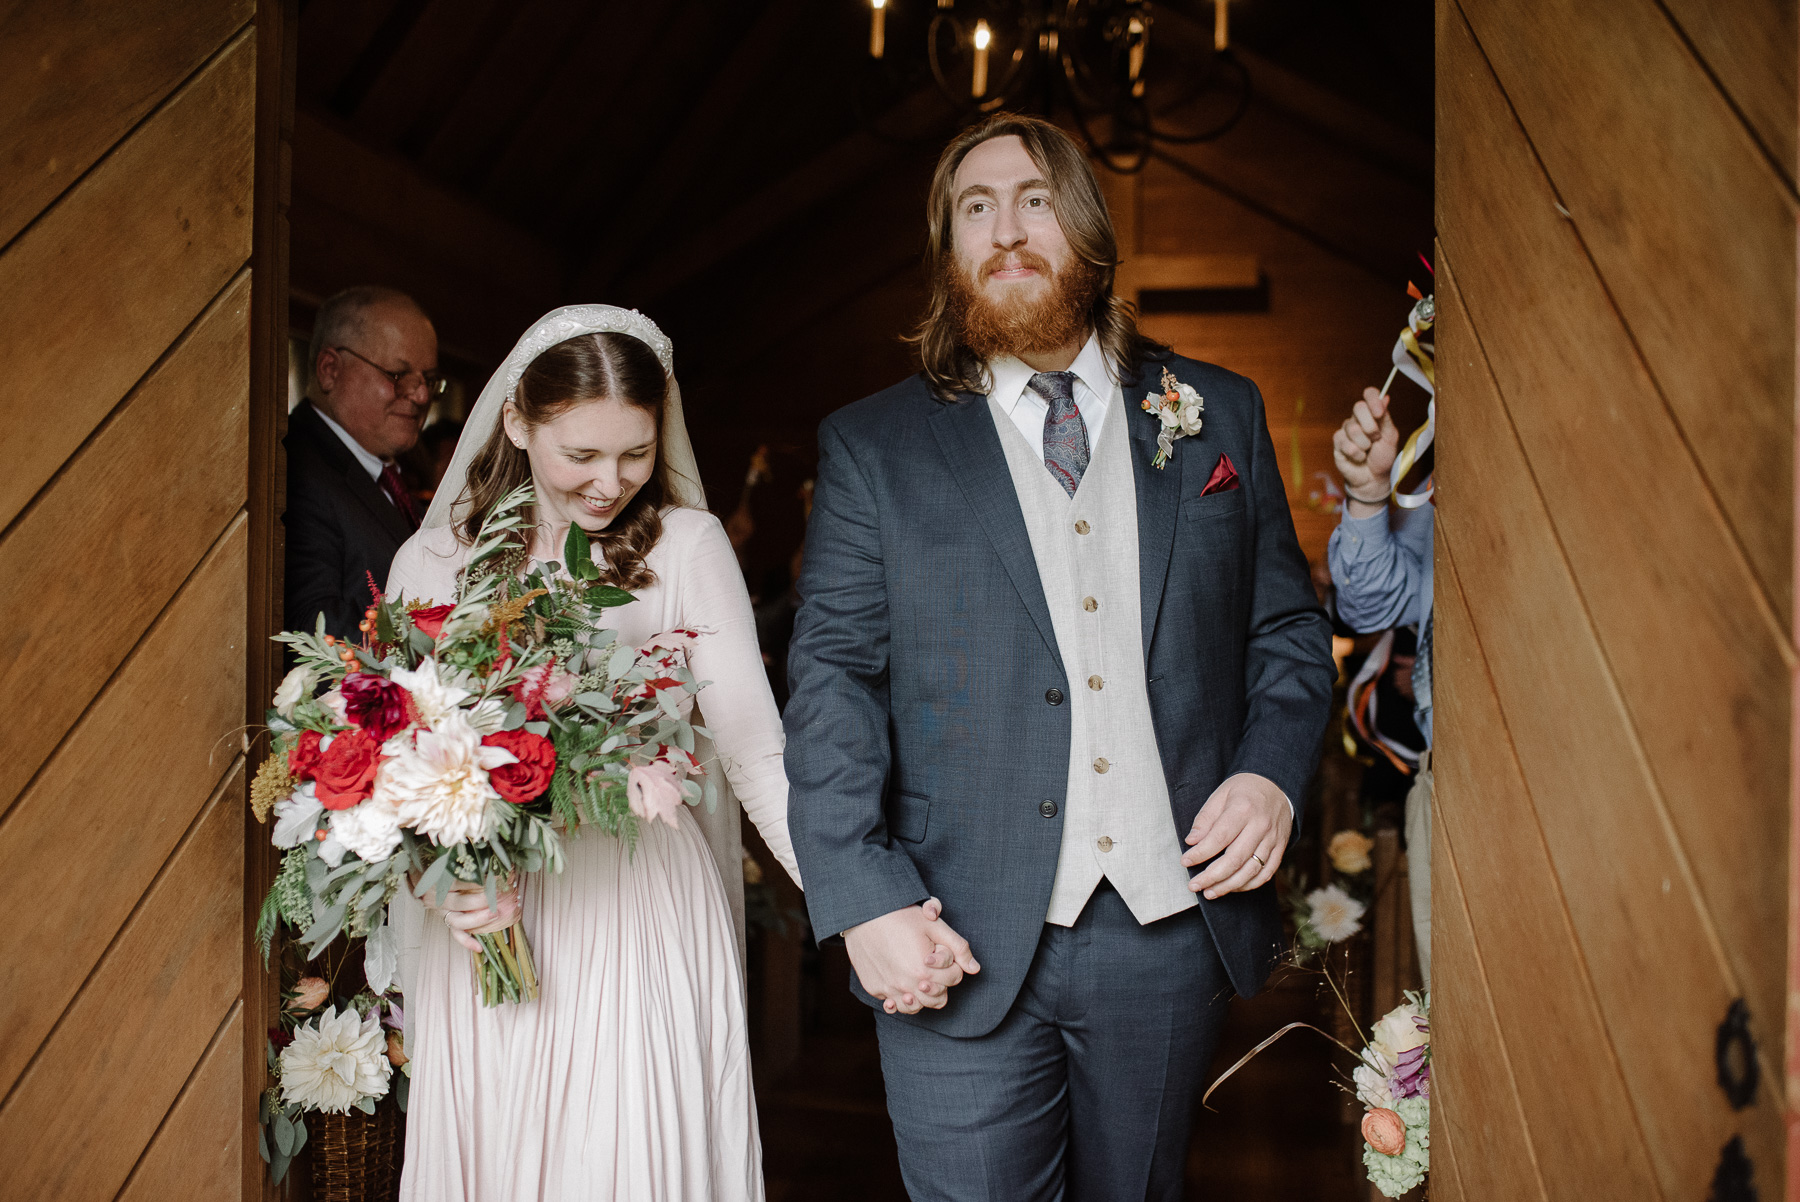 enowen-wedding-photography-linville-nc-carson-john-elopement (80 of 109).jpg